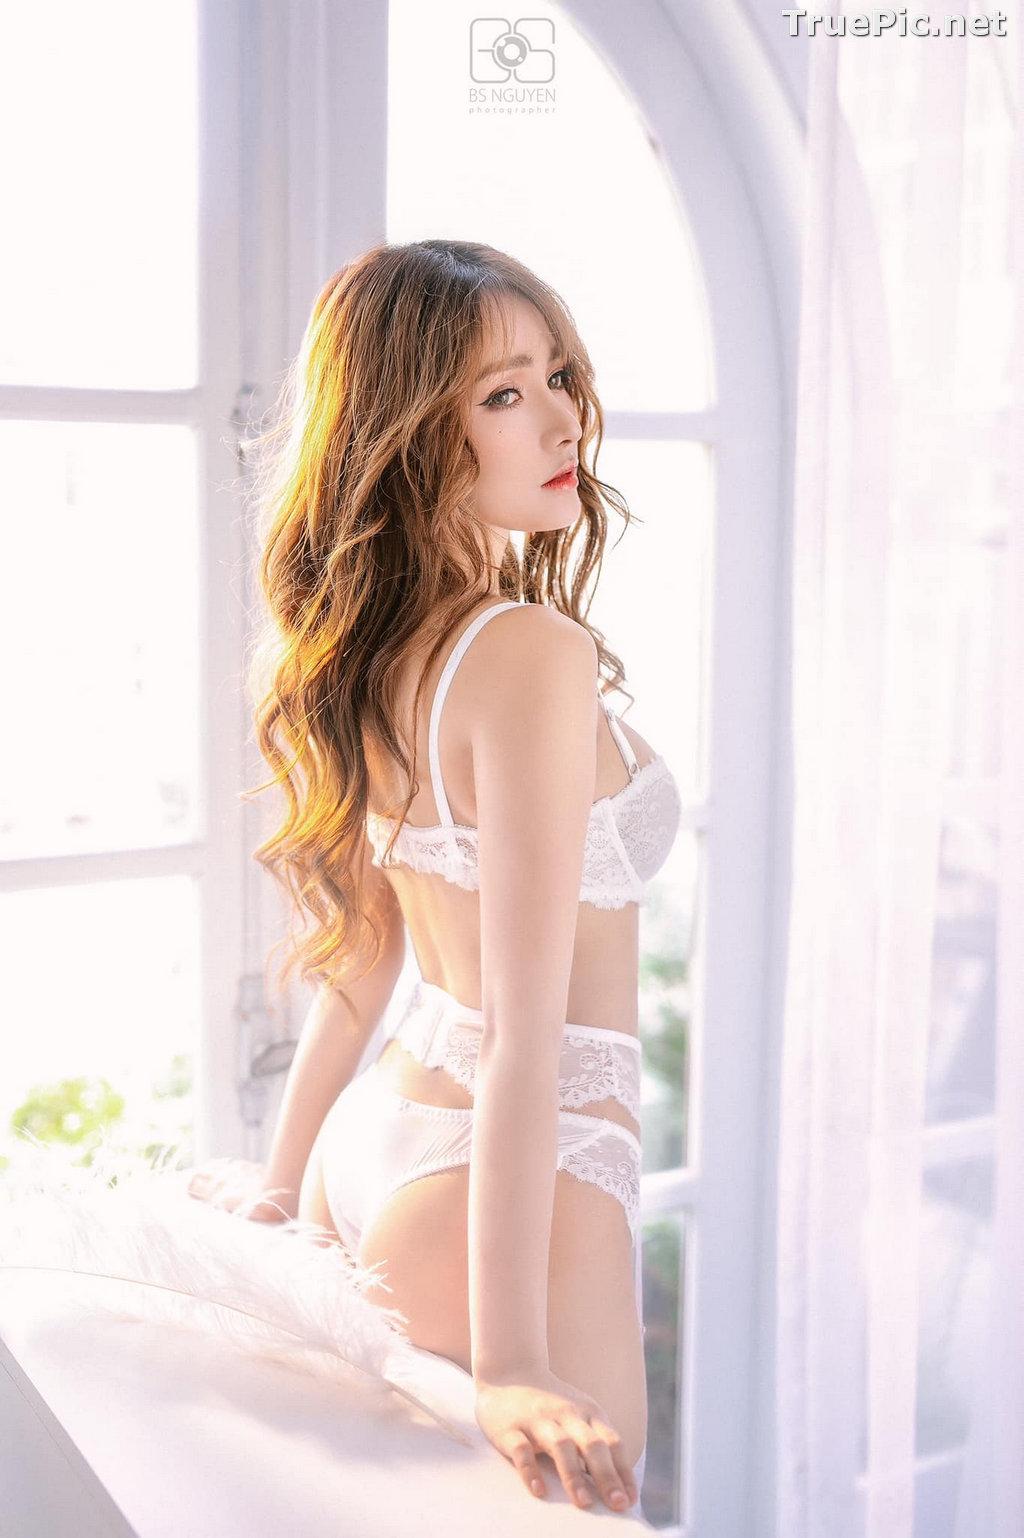 Image Vietnamese Model - Nguyen Thi Phi Yen - Beautiful Sexy White Lingerie - TruePic.net - Picture-21